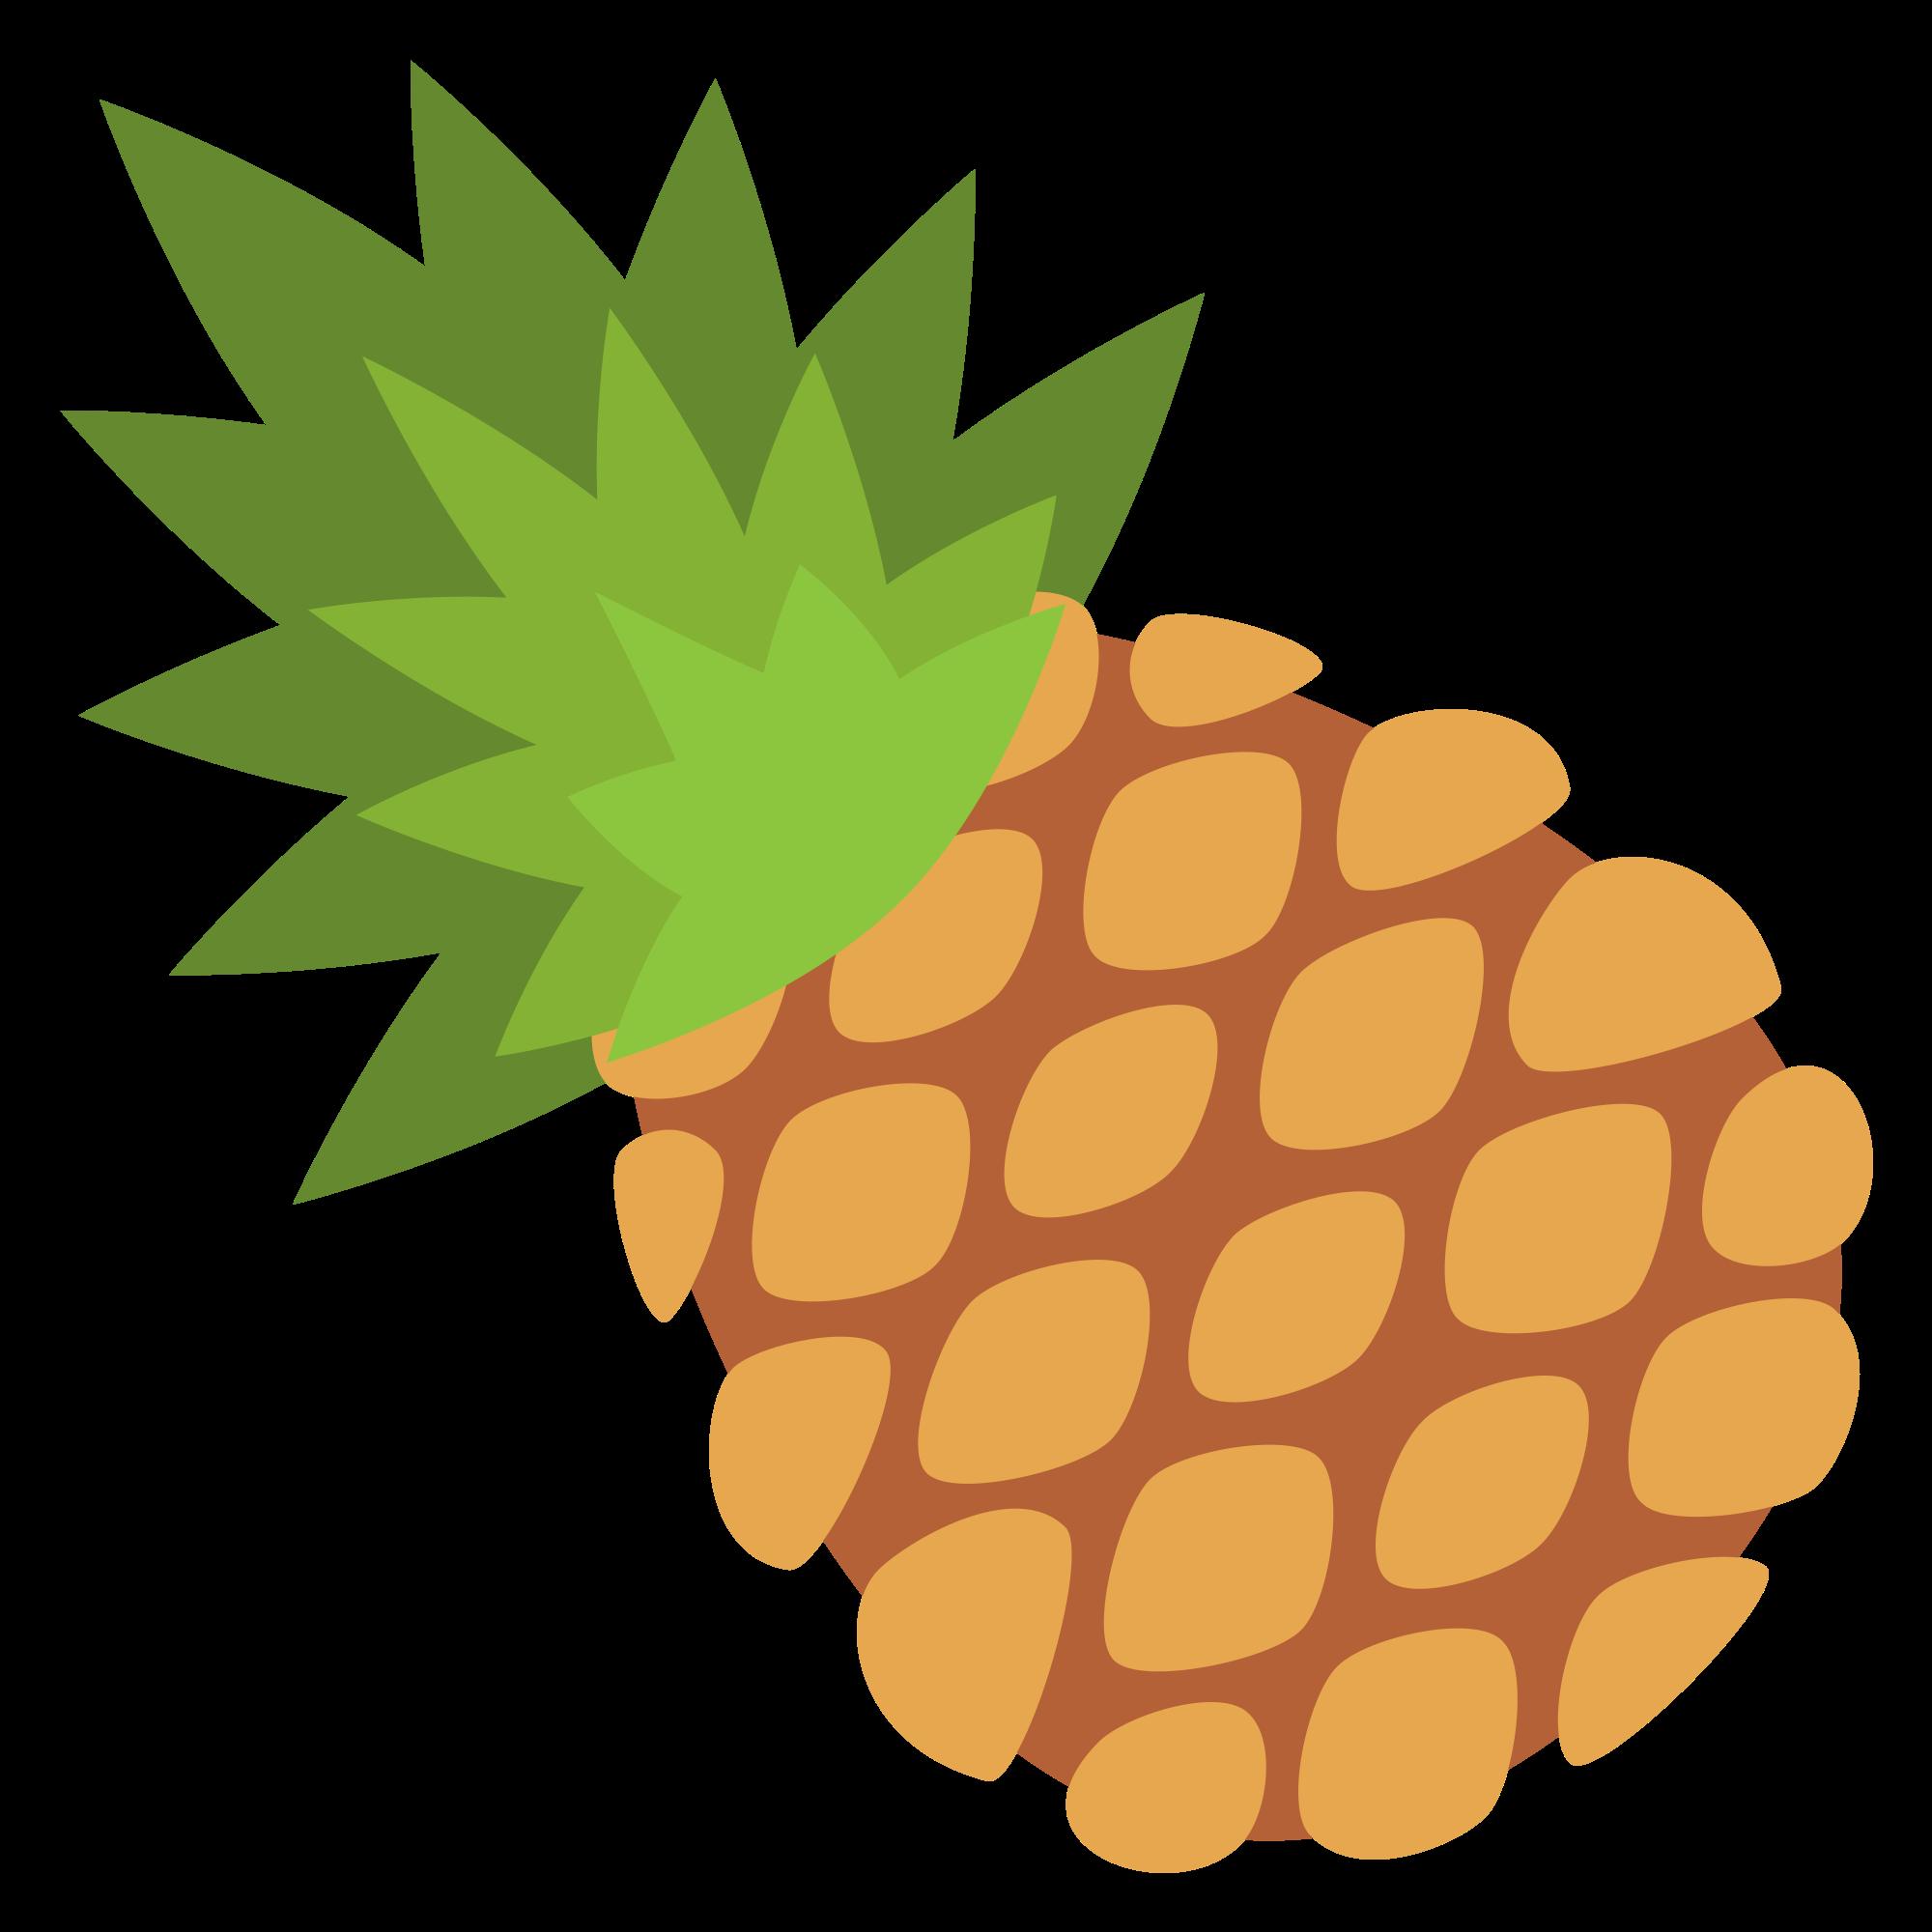 jpg royalty free download one svg pineapple #100609443